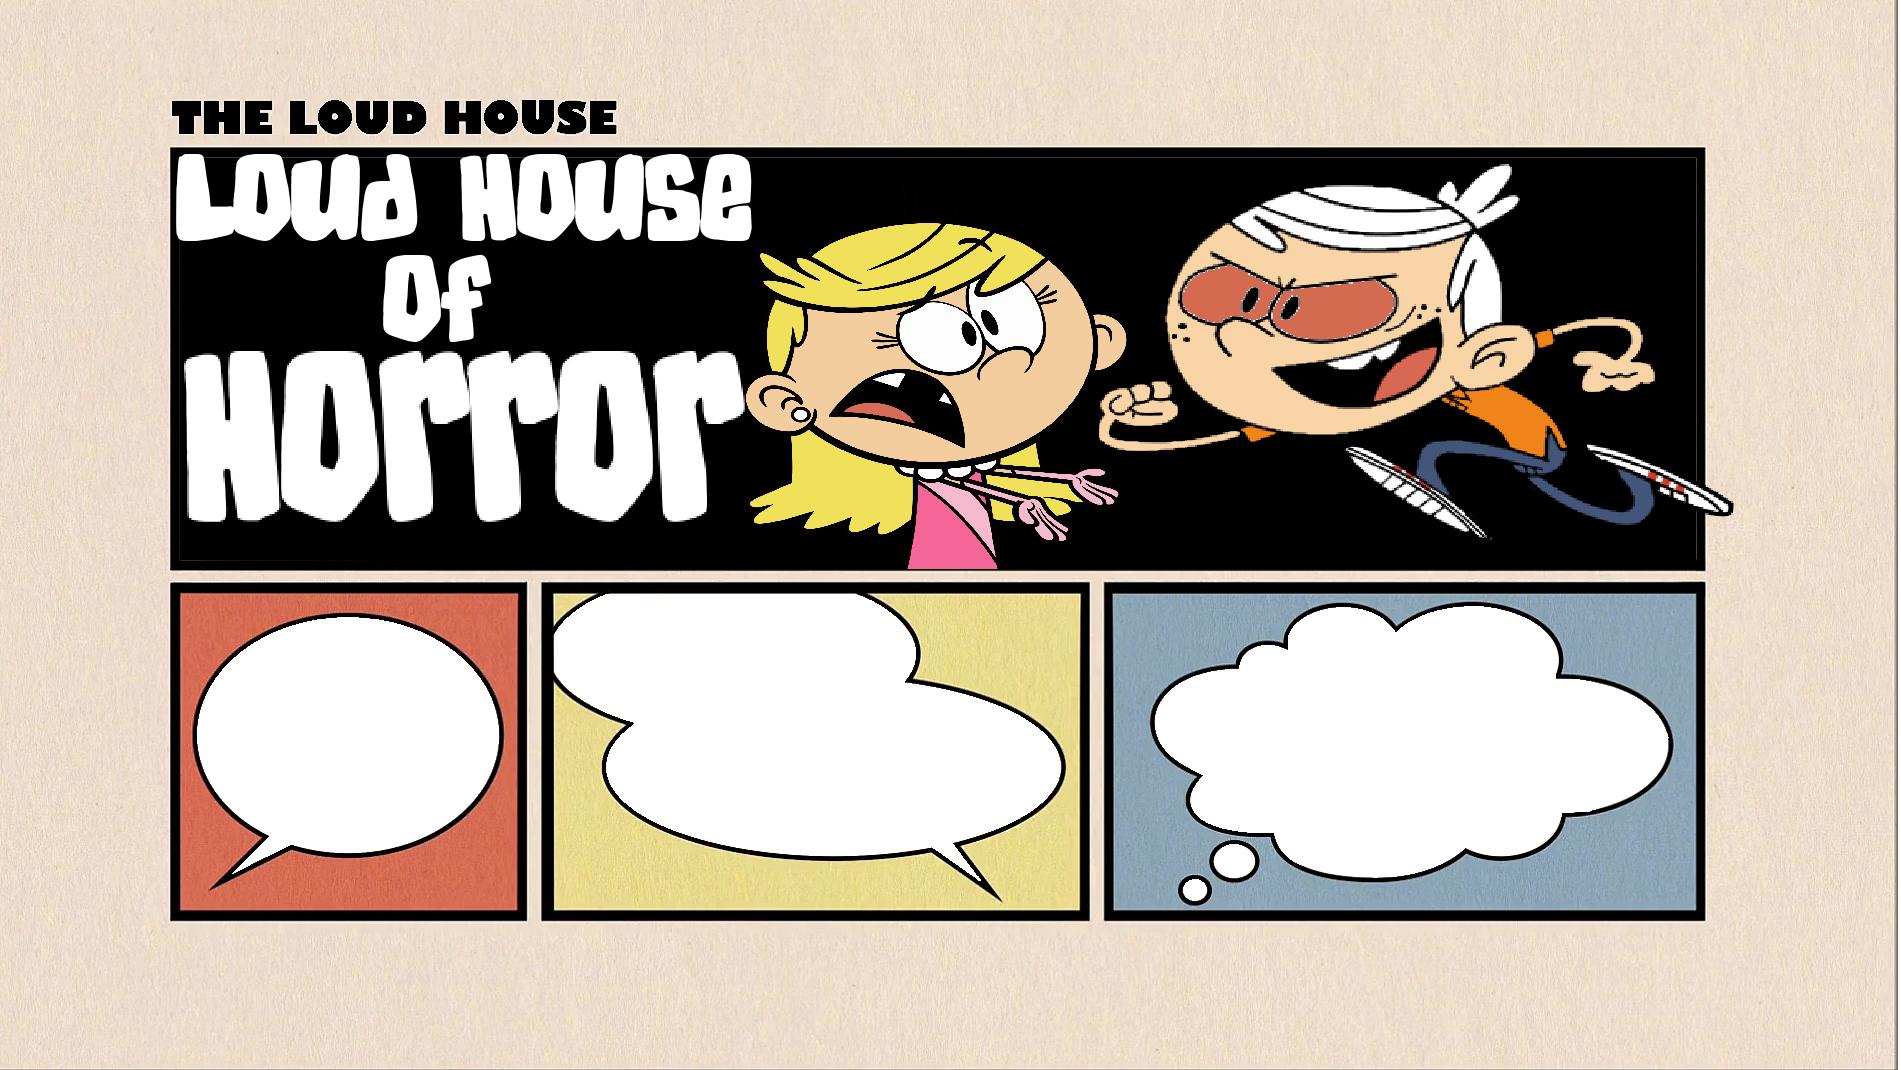 Loud House of Horror | The Loud House Fanon Wikia | FANDOM powered